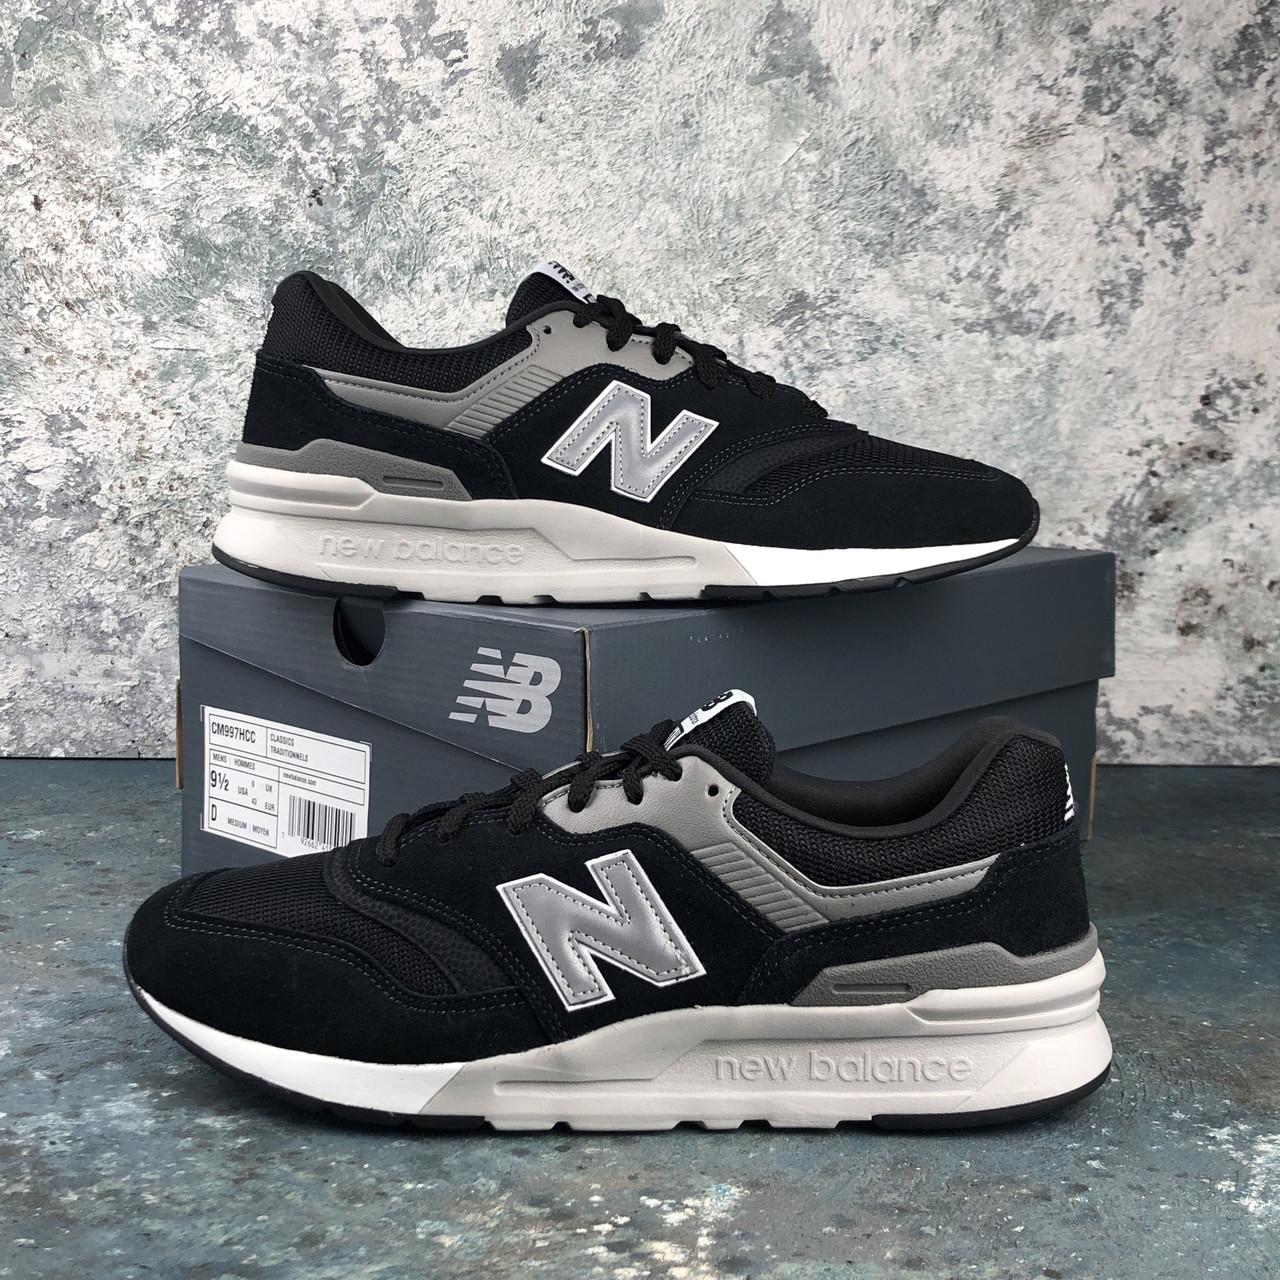 Мужские кроссовки New Balance 997 H Black\Silver CM997HCC. Оригинал. Замша. Подошва резина, фото 1